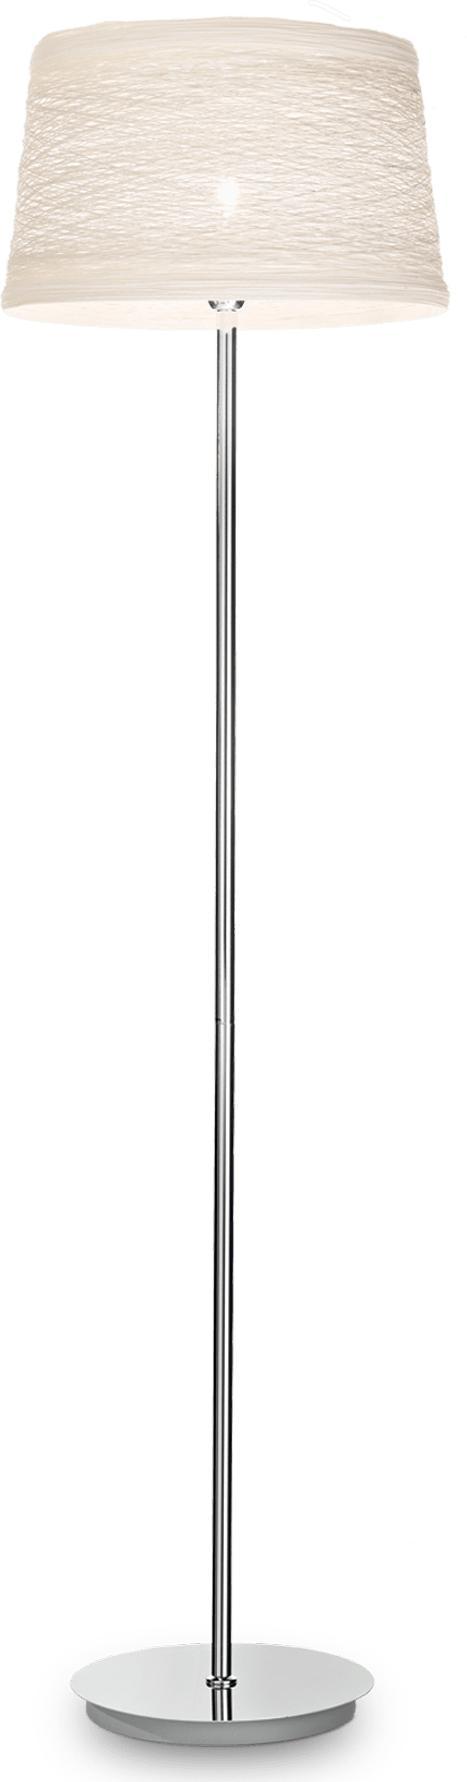 Ideal lux LED Basket Lampe stehende s5W 82448